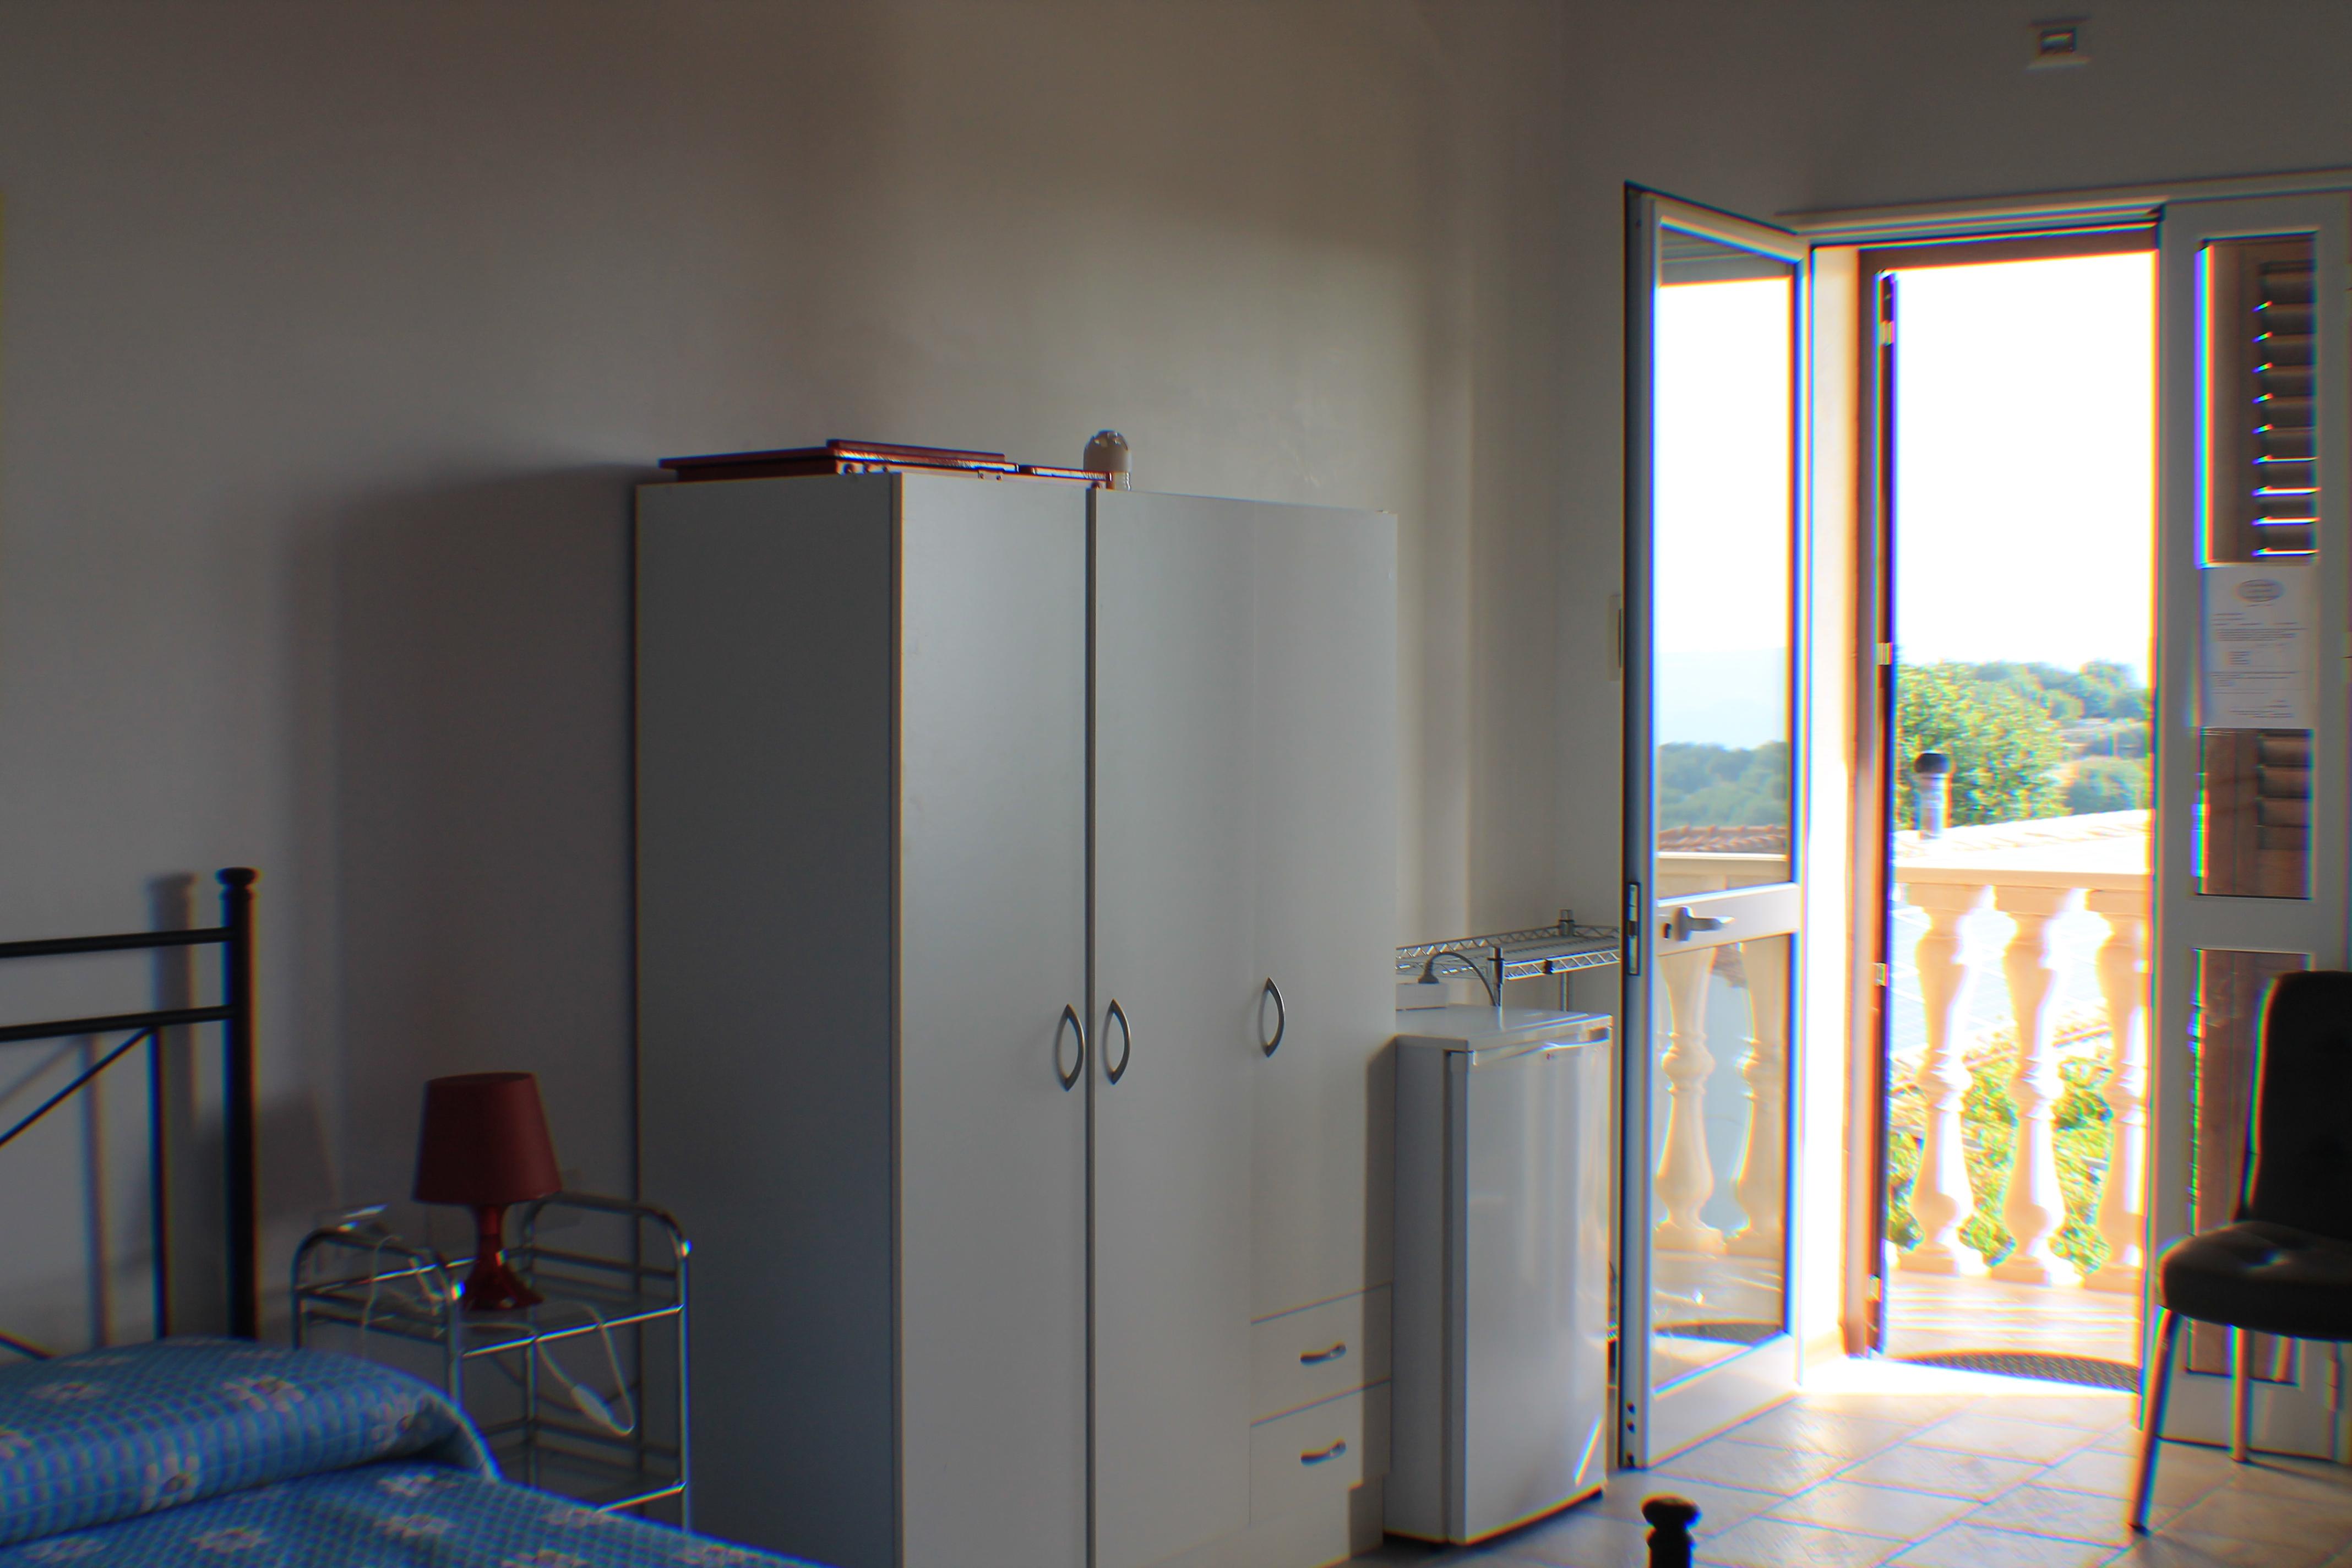 Appartement de vacances Agriturismo Le Due Palme - Das Paradies Von Adamo (2506981), Modica, Ragusa, Sicile, Italie, image 14